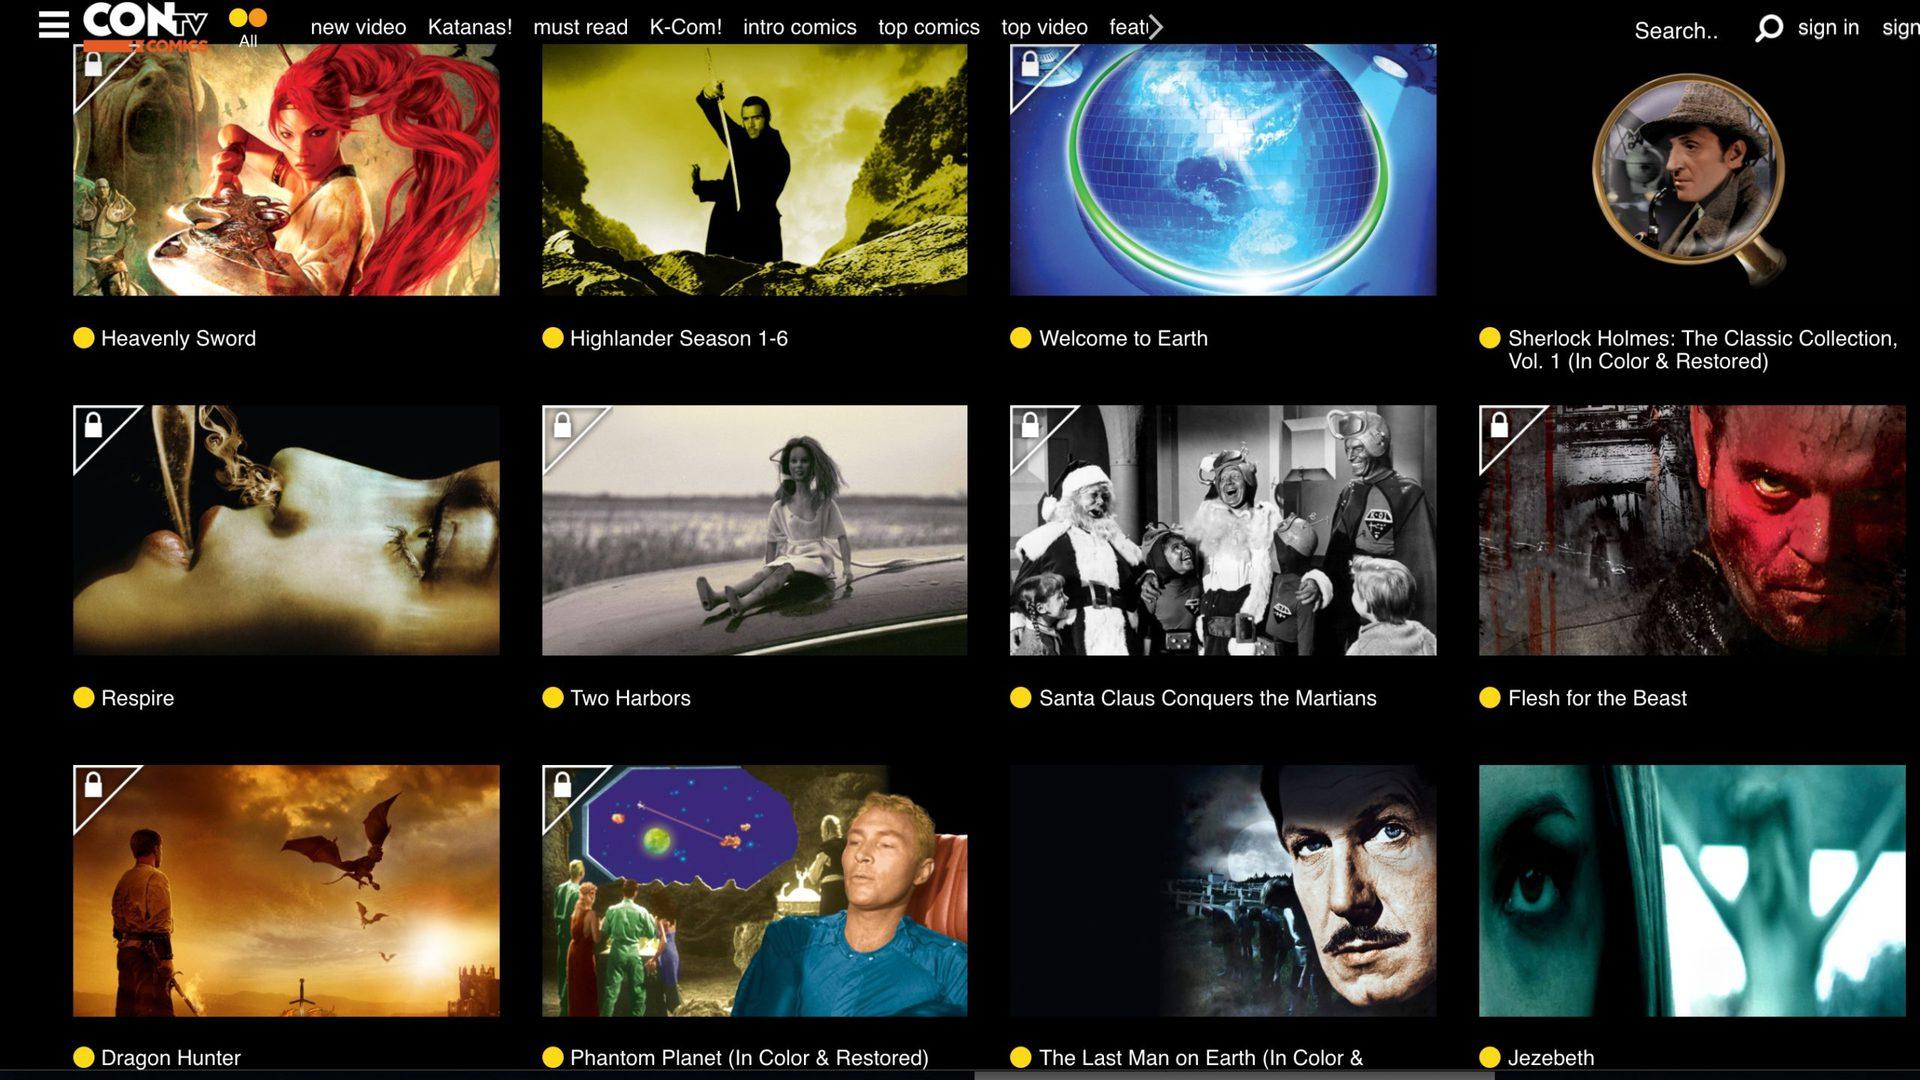 ConTV Screenshot - free movies website